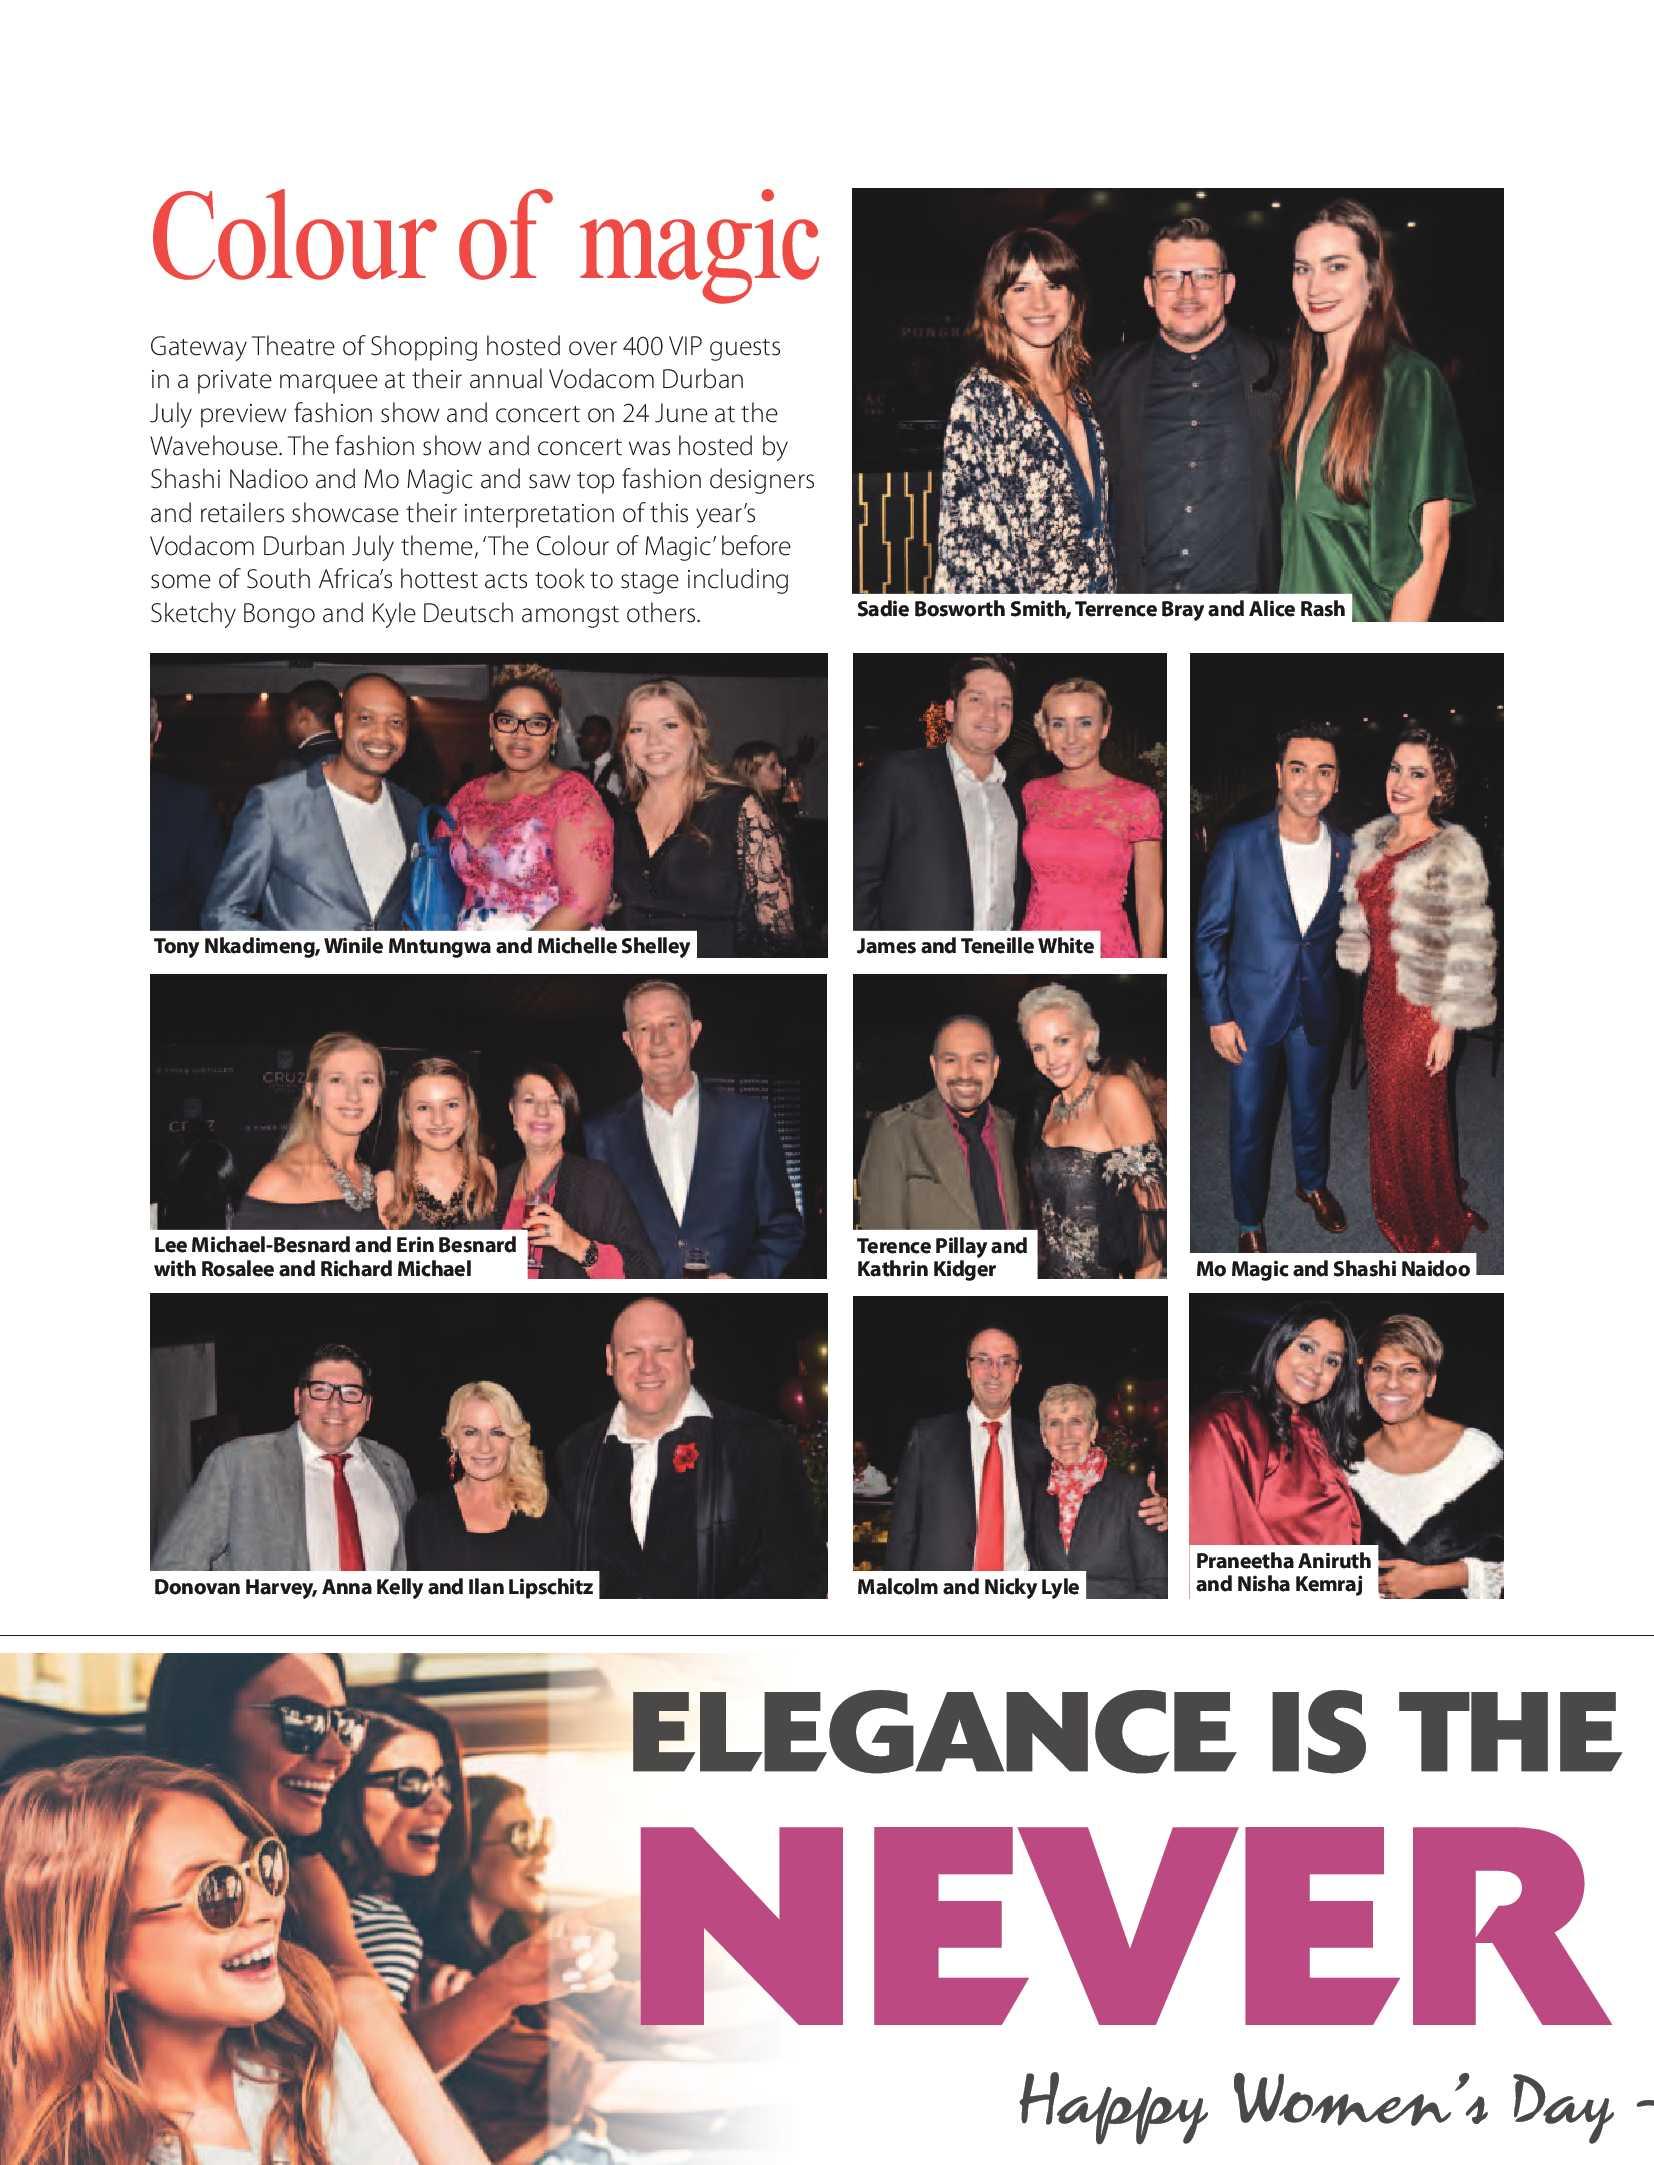 get-magazine-ballitoumhlanga-august-2017-epapers-page-12